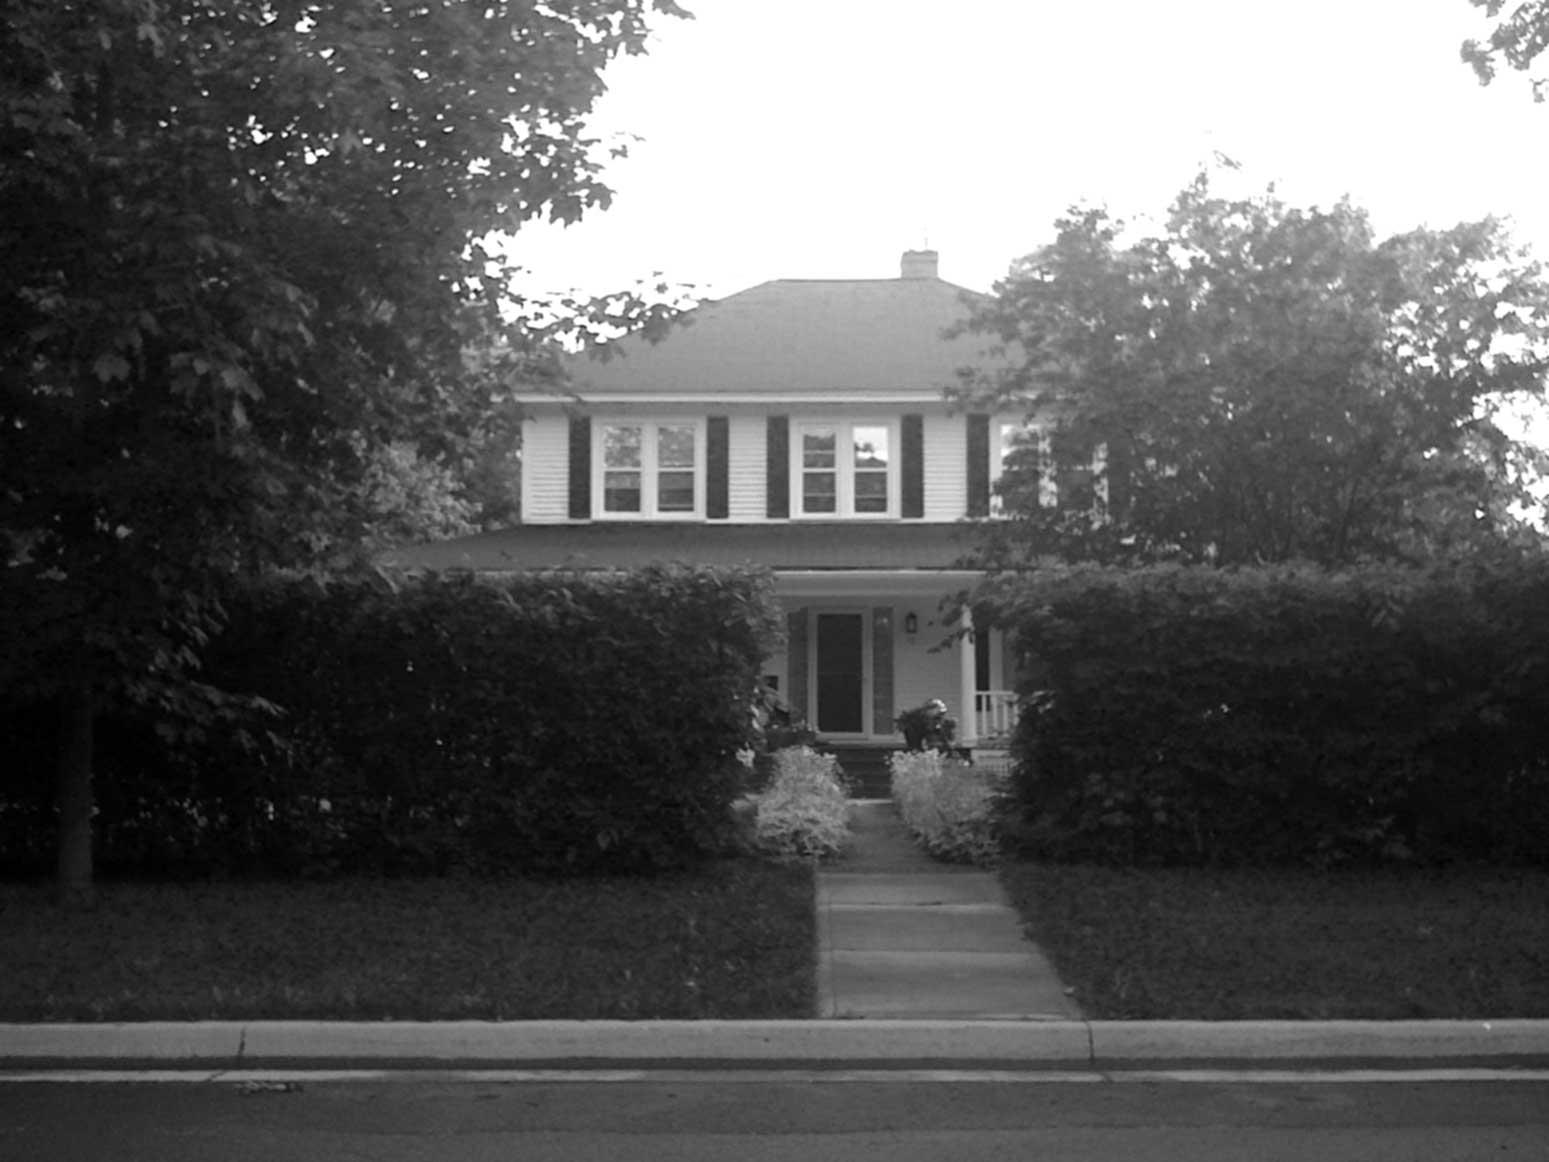 Sharon Pollock's Home